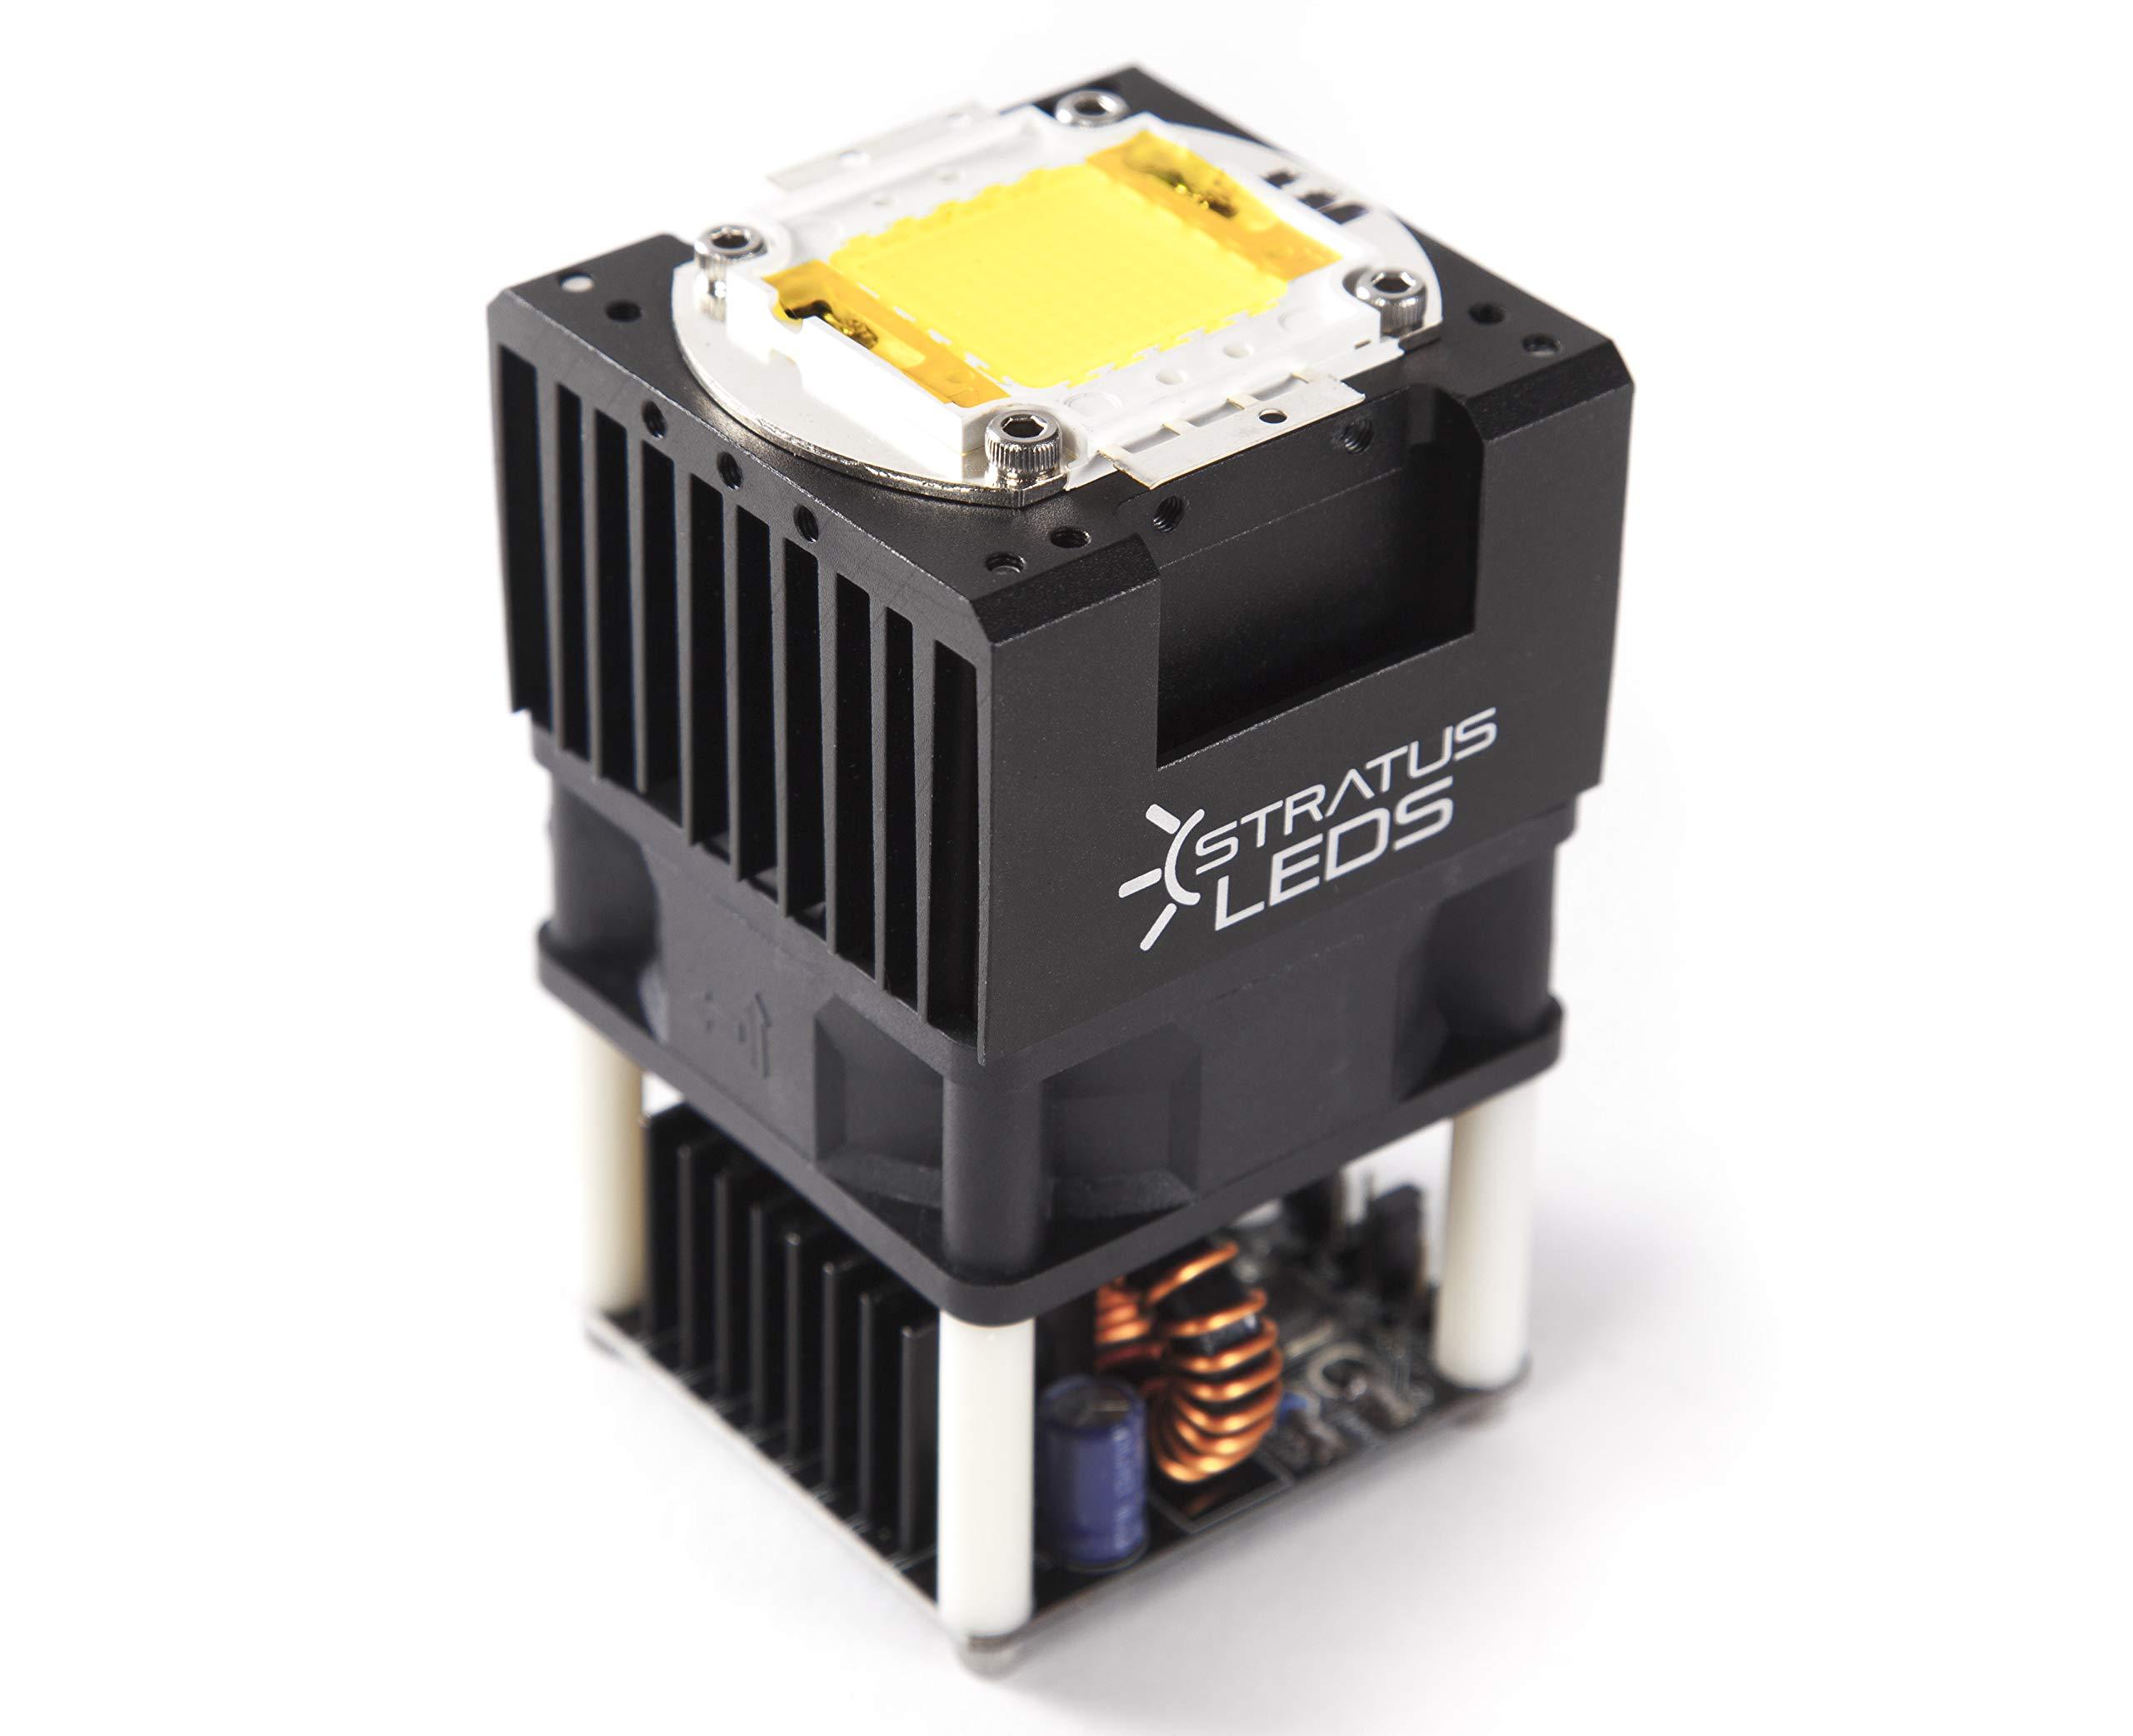 High Power 100W LED Spot Light Module DC 12V / 24V - Stratus LEDs (5600K - 12V - 80CRI - 13000 Lumens) by Stratus Productions (Image #1)